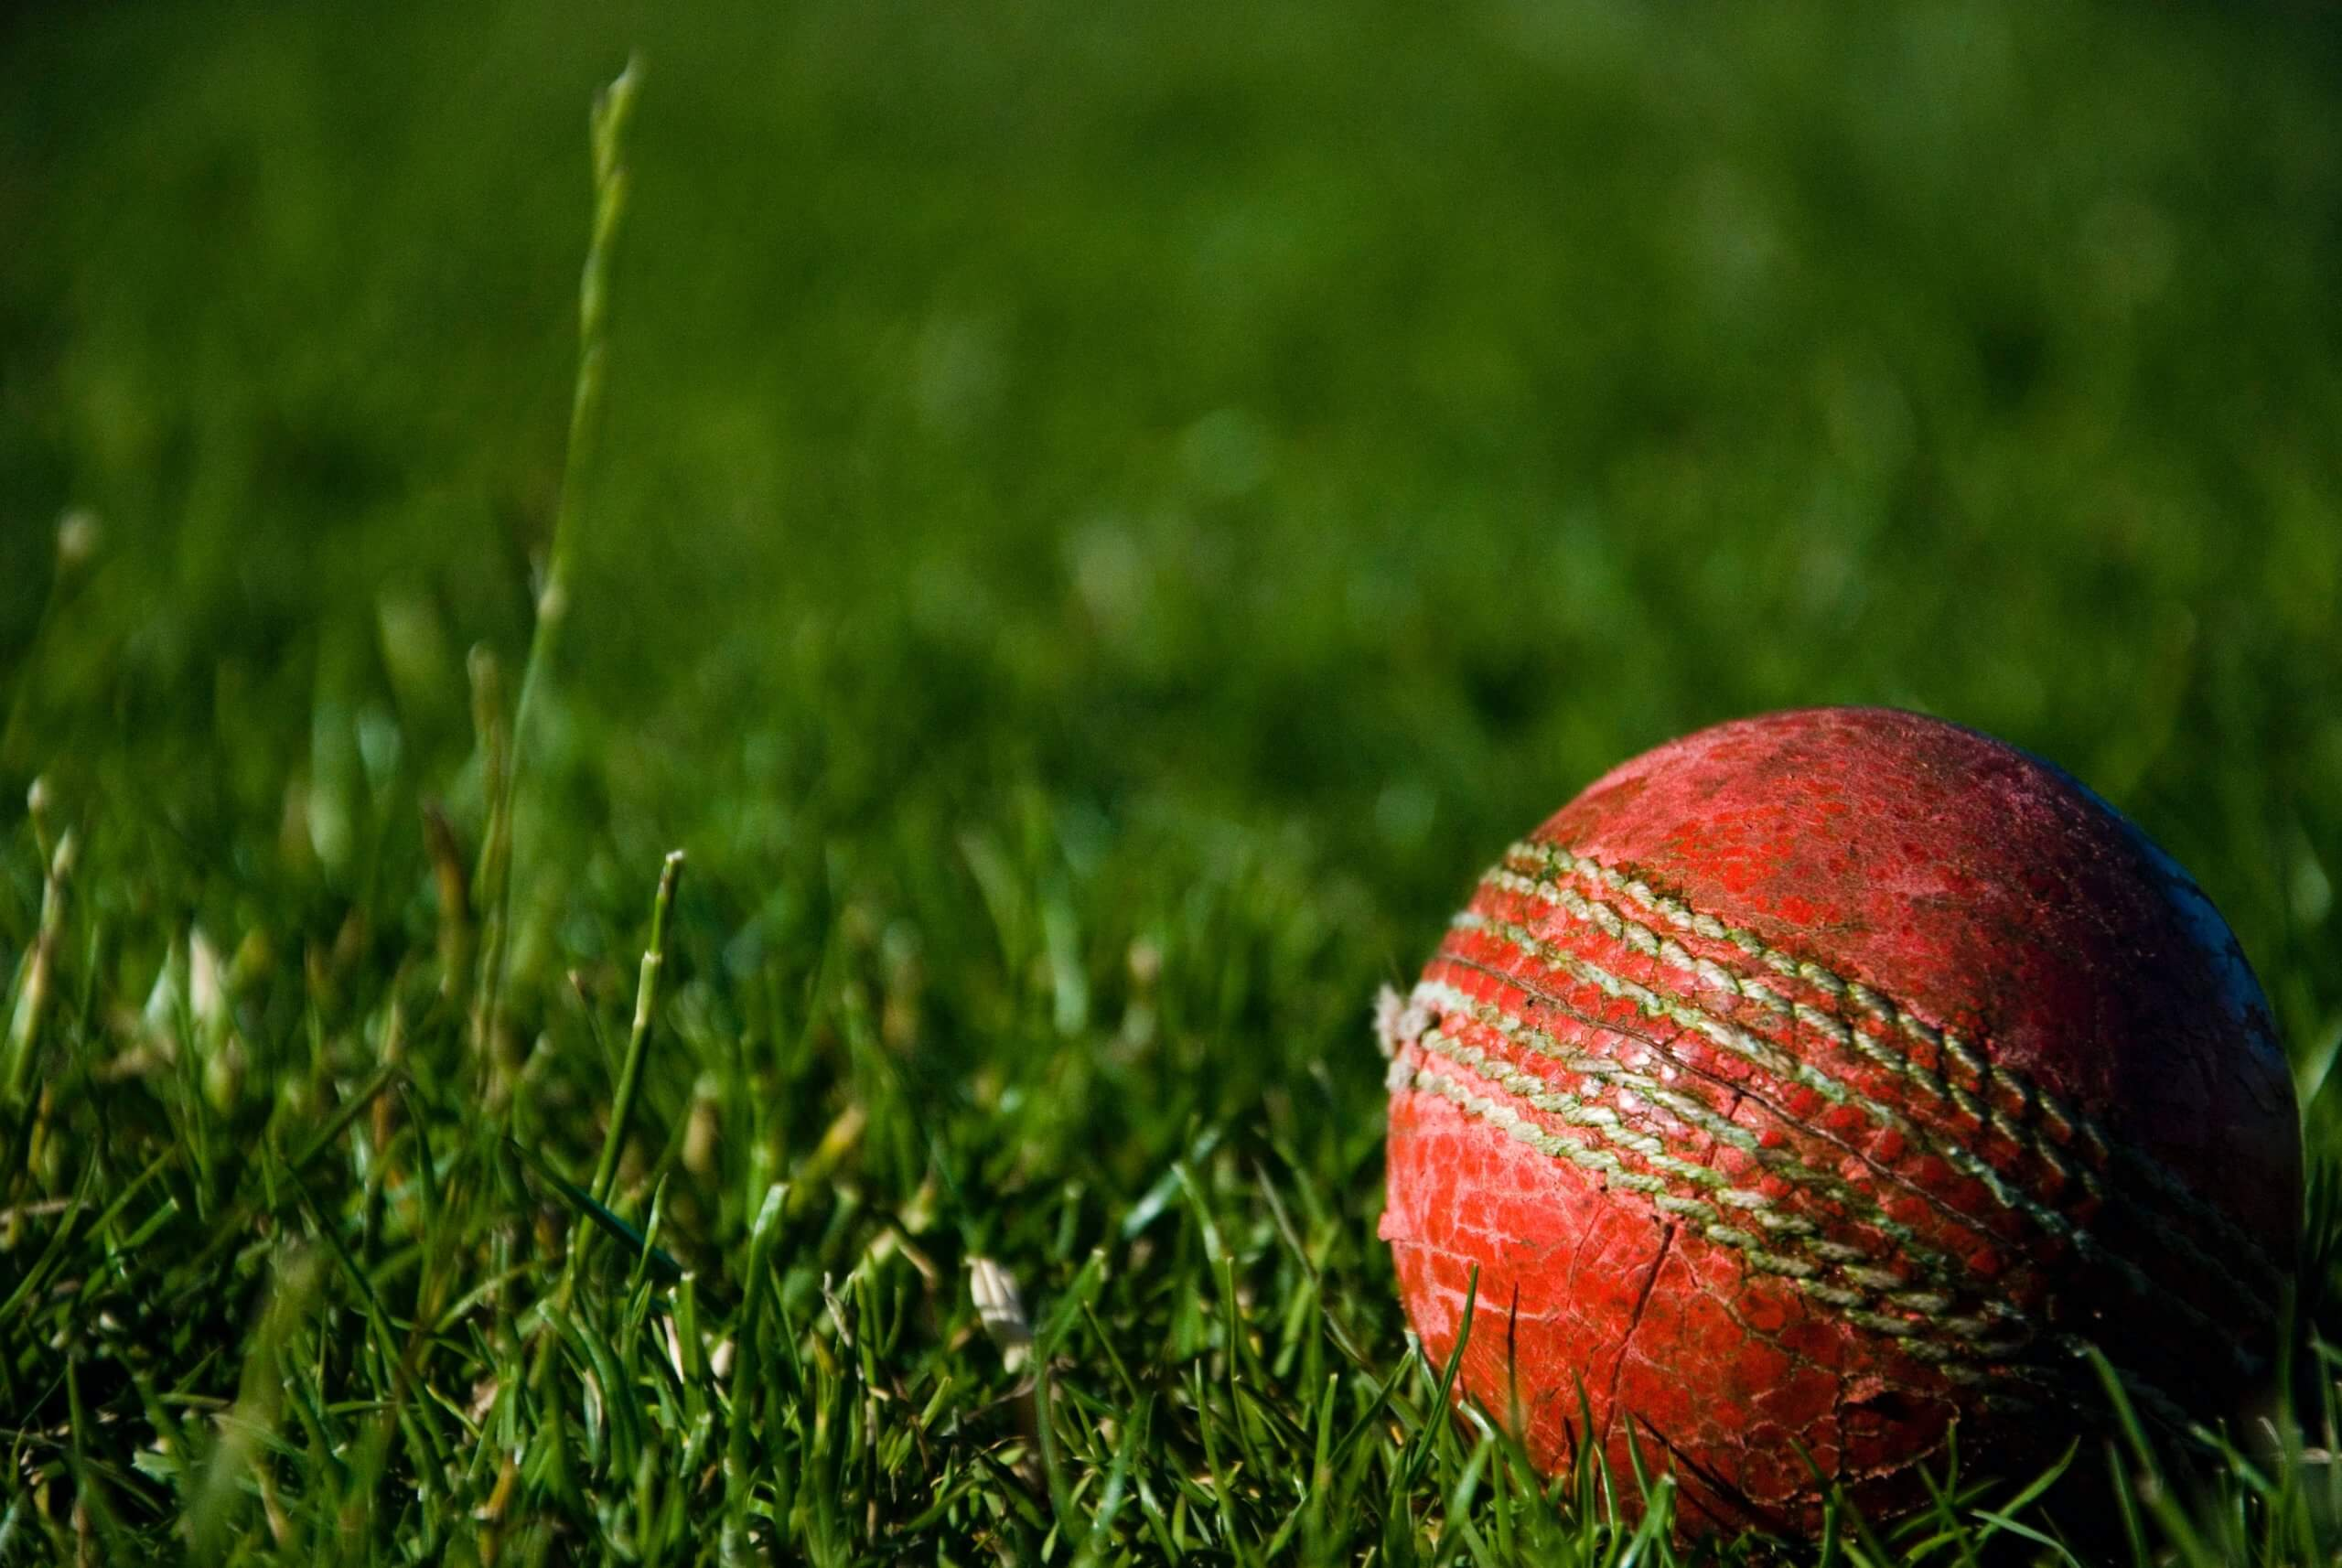 Cricket: England's 2021 Preview